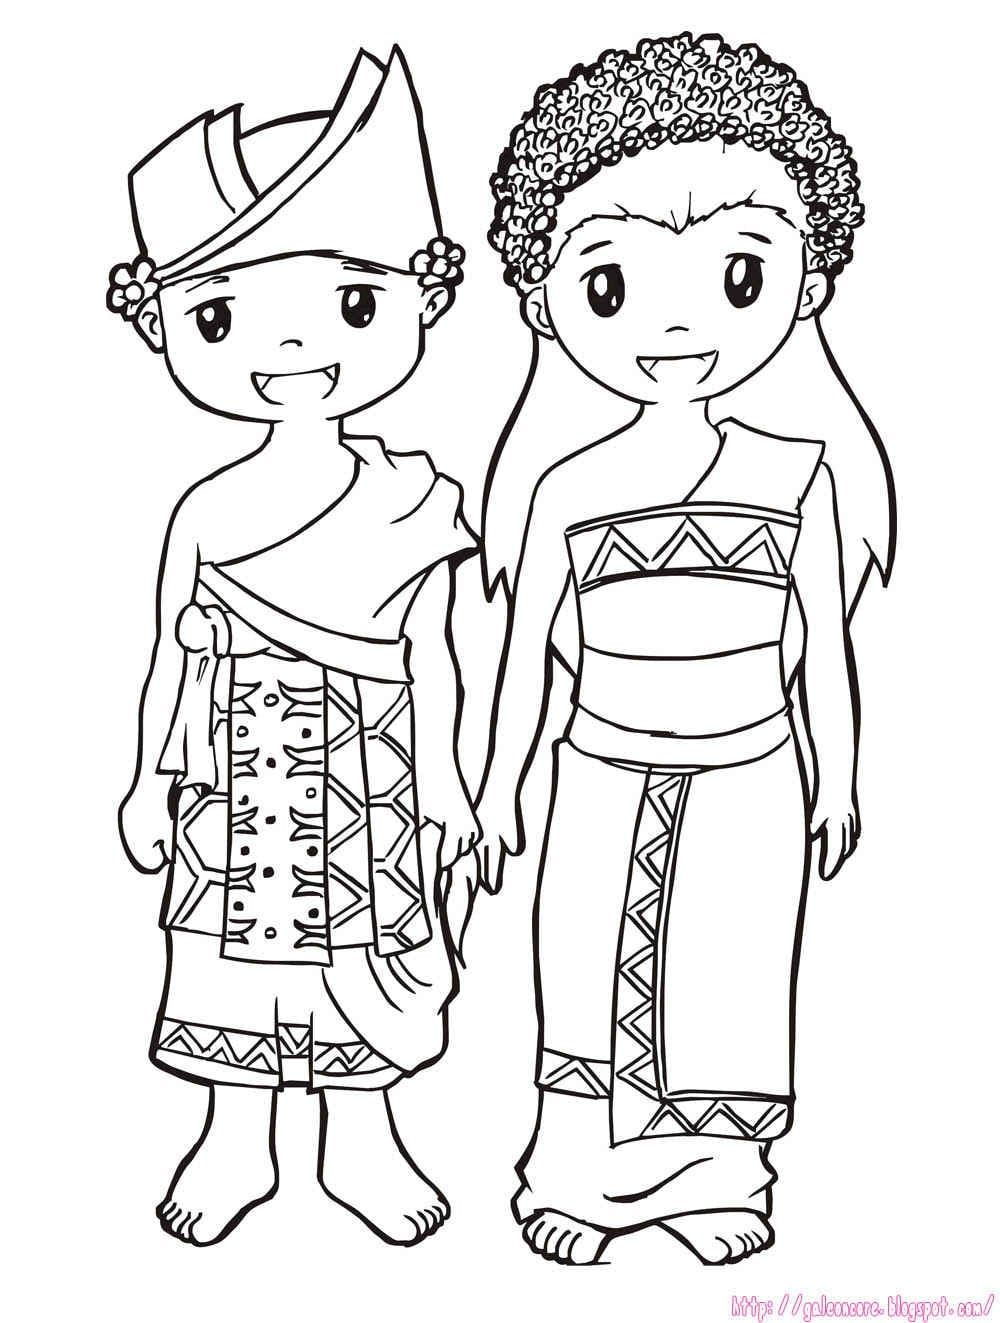 Gambar Pakaian Adat Bali Animasi